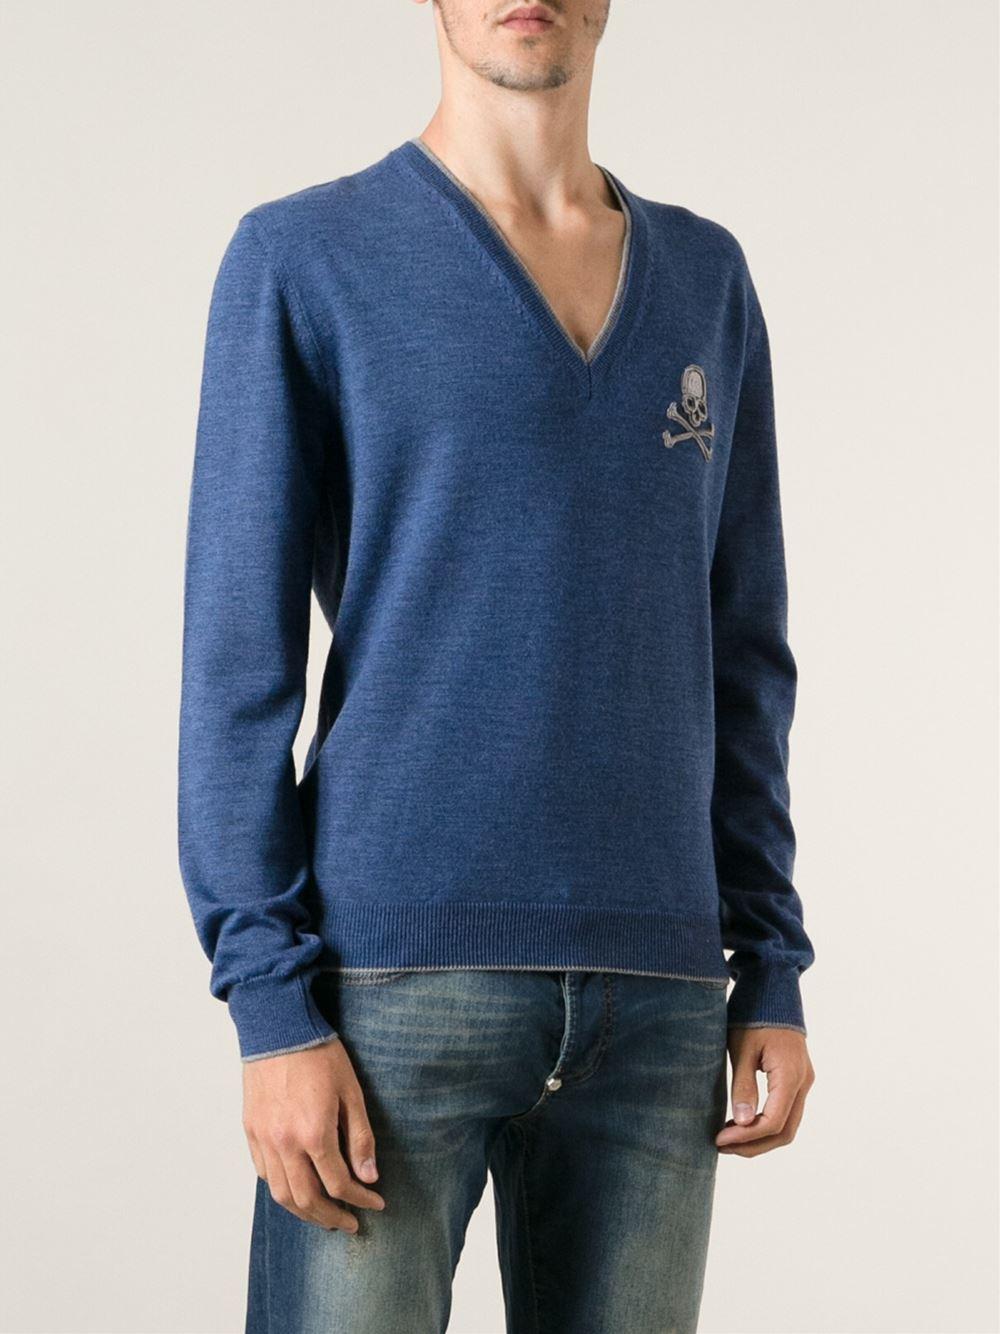 lyst philipp plein skull sweater in blue for men. Black Bedroom Furniture Sets. Home Design Ideas